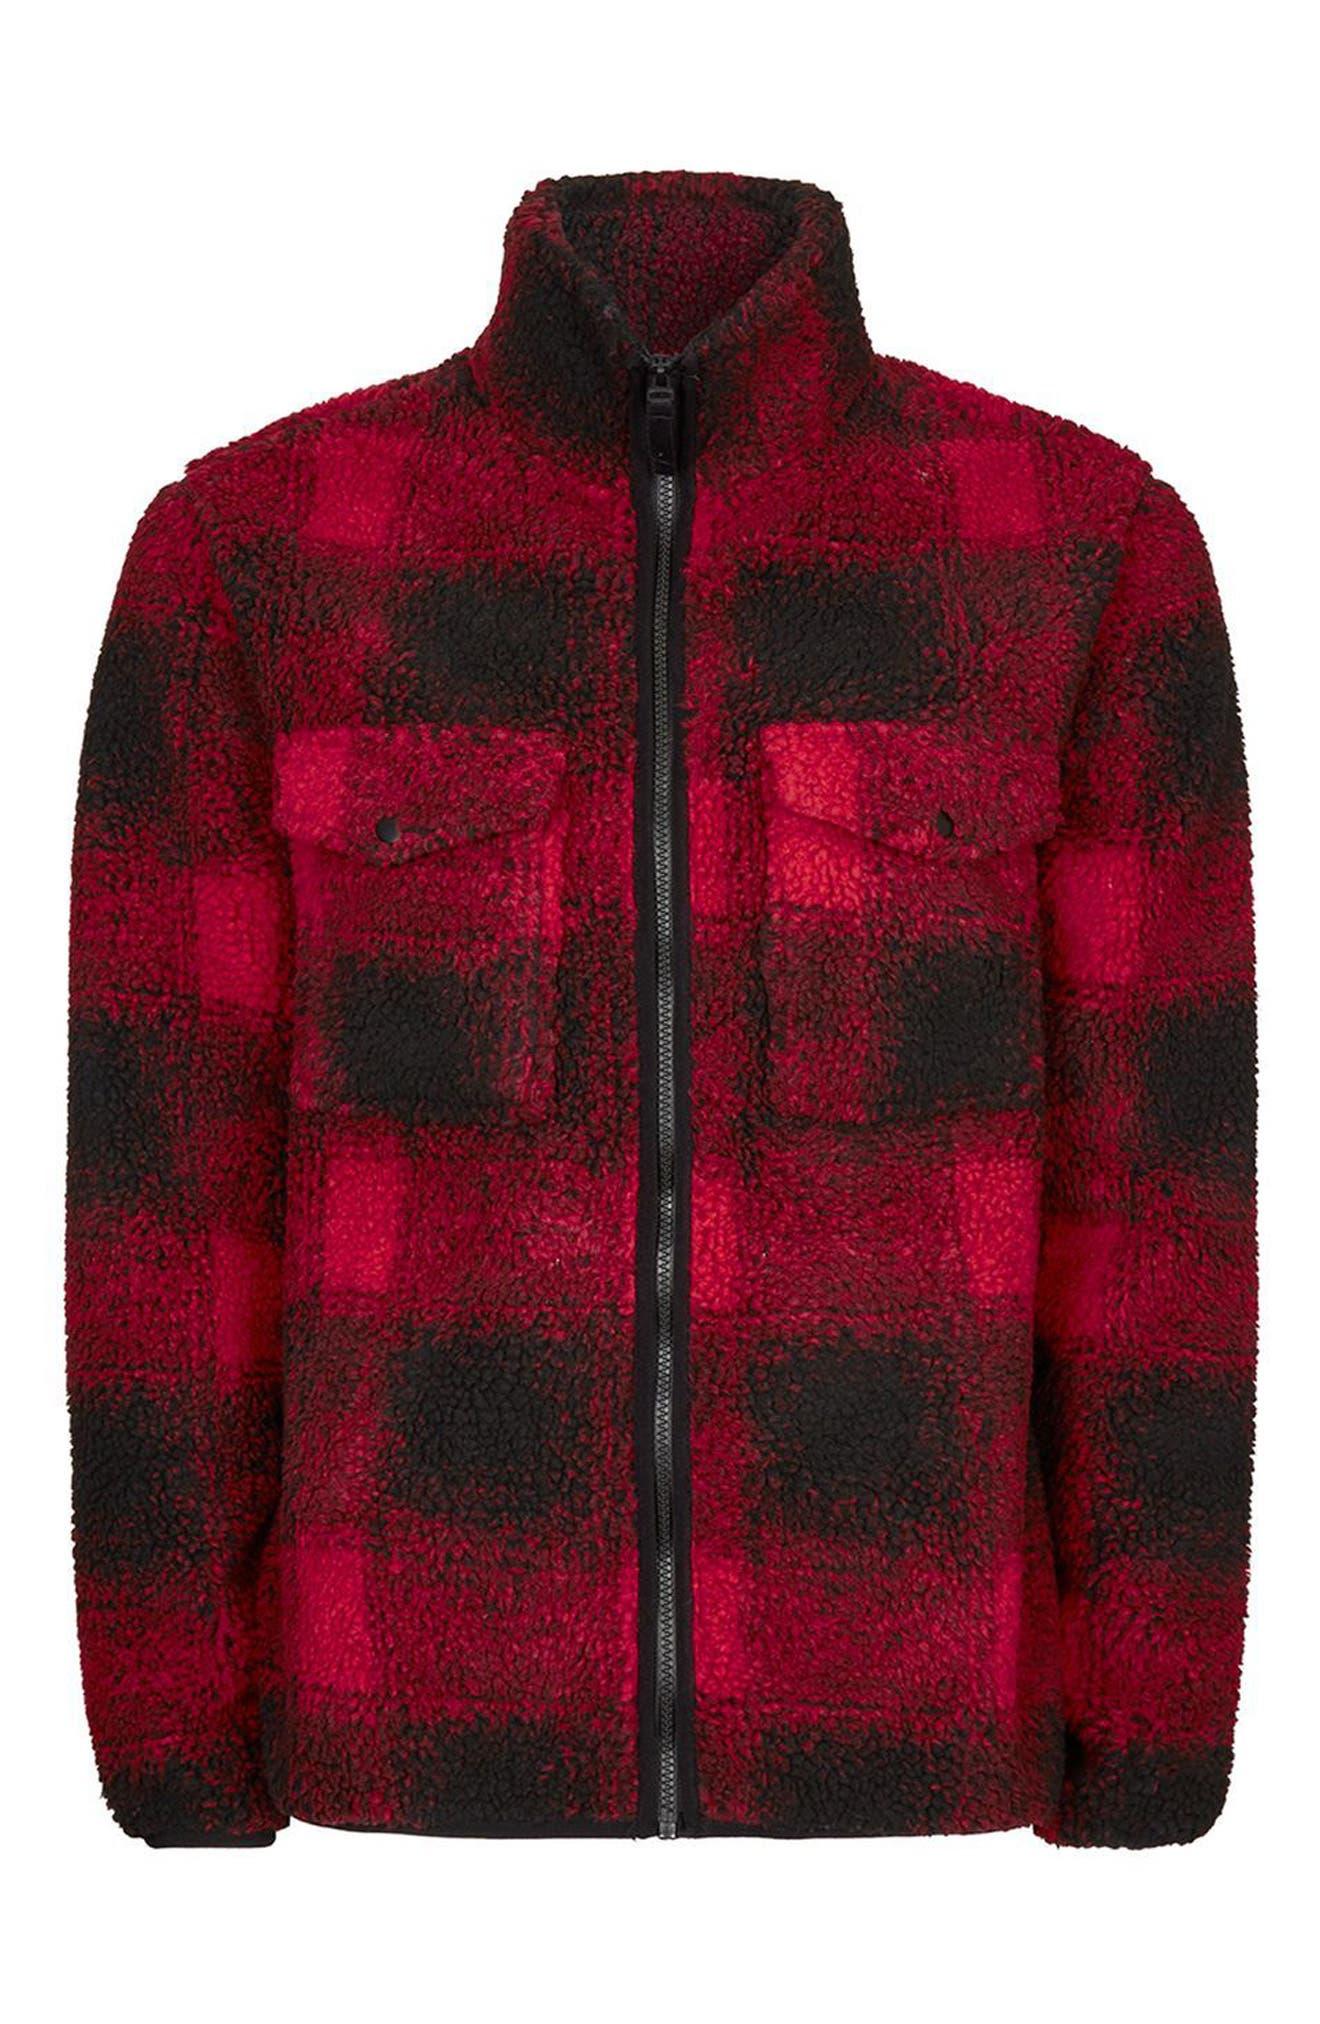 Buffalo Check Borg Jacket,                             Alternate thumbnail 4, color,                             Red Multi